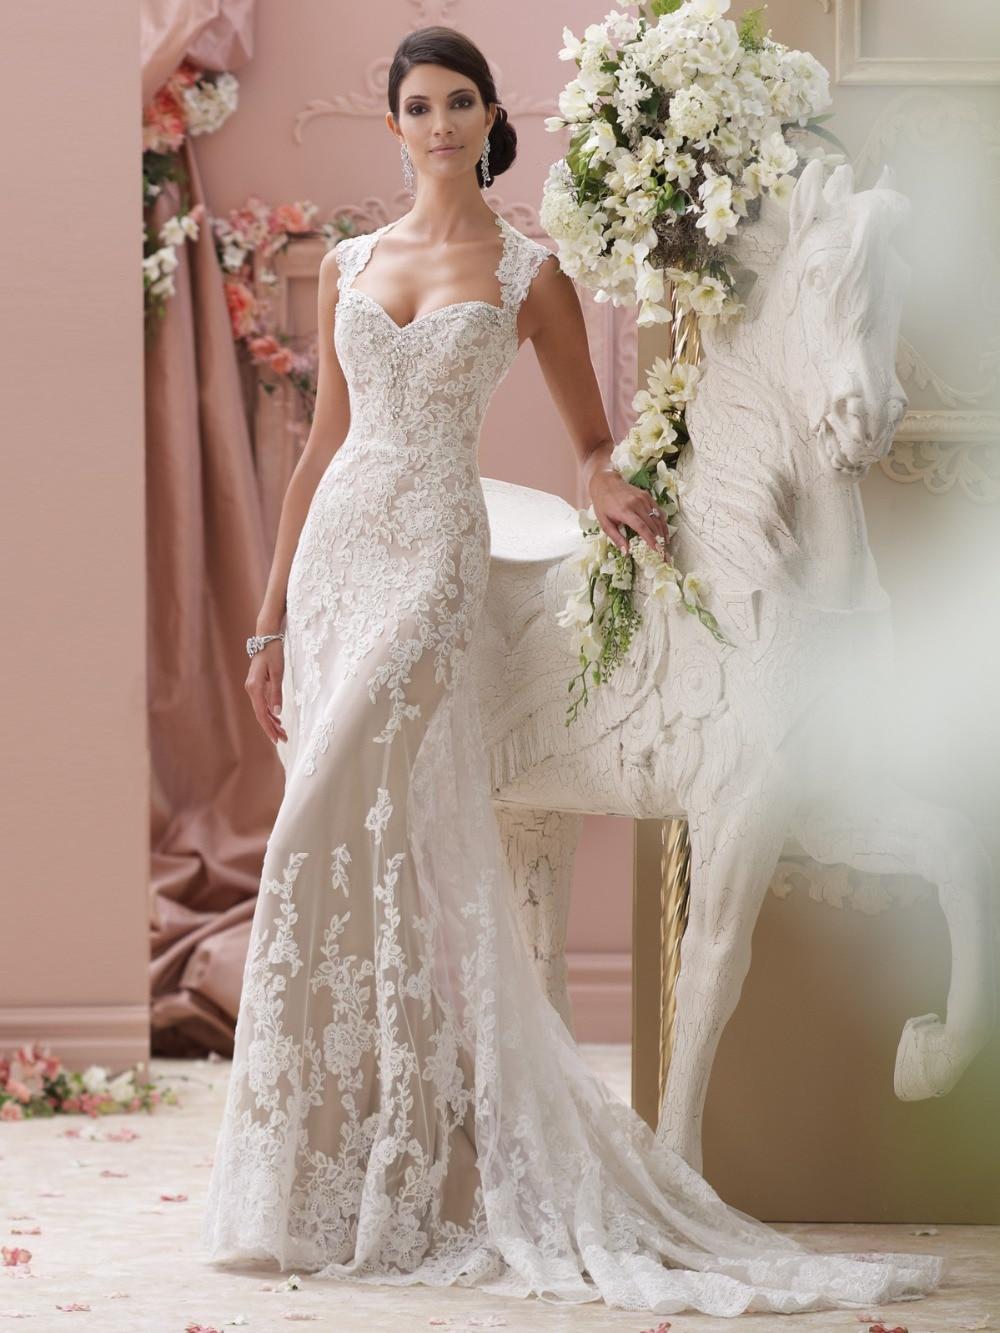 Beautiful New Model Lace Appliques Open Back Mermaid Wedding Dress 2015 Amanda Novias